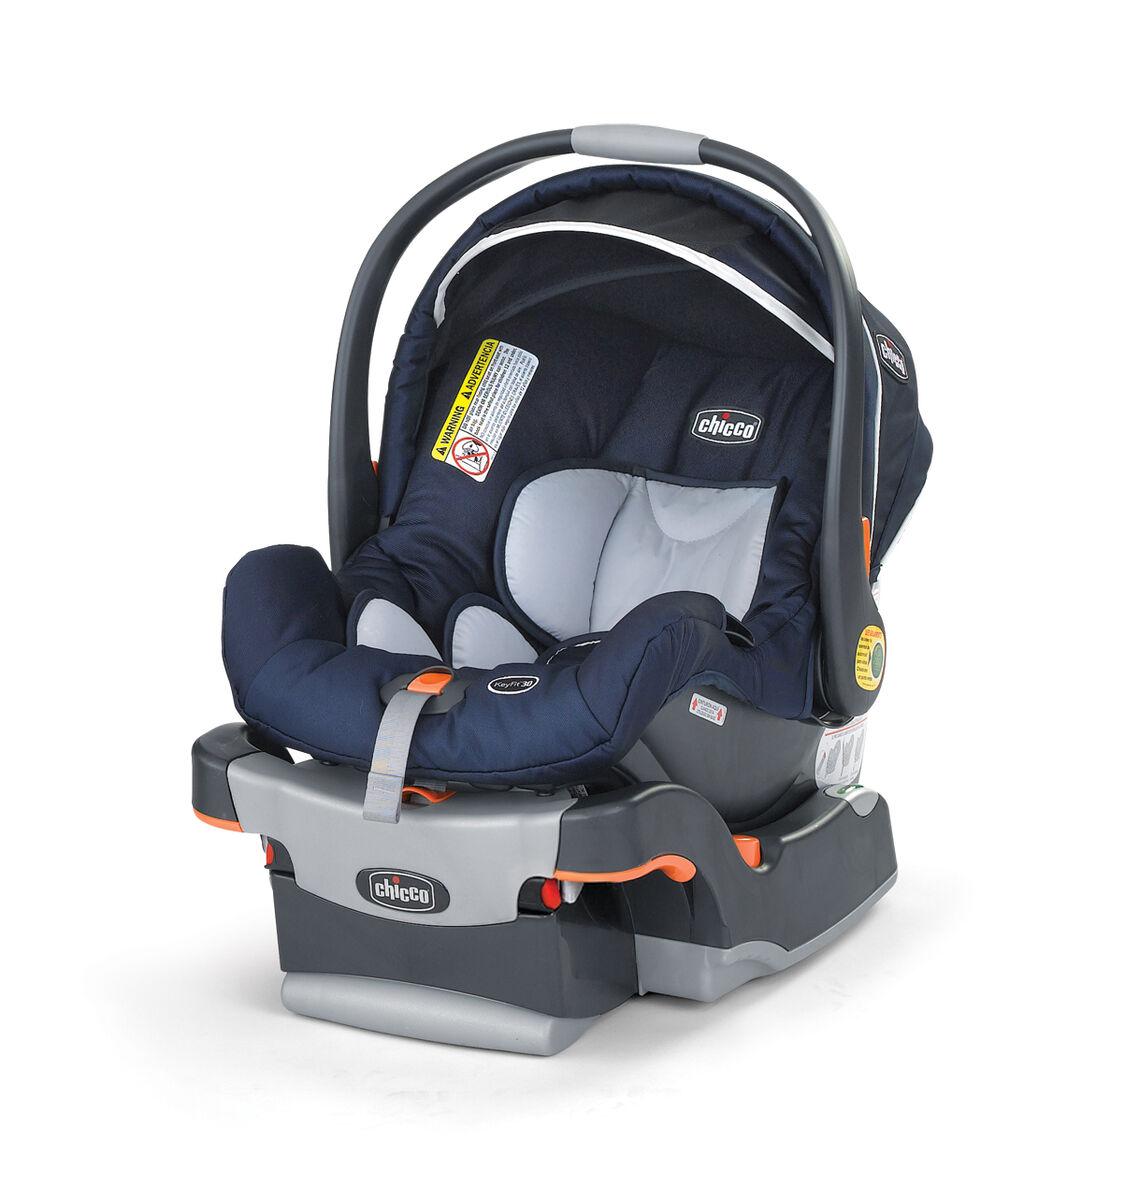 Keyfit 30 infant car seat base pegasokeyfit 30 infant car seat base pegaso